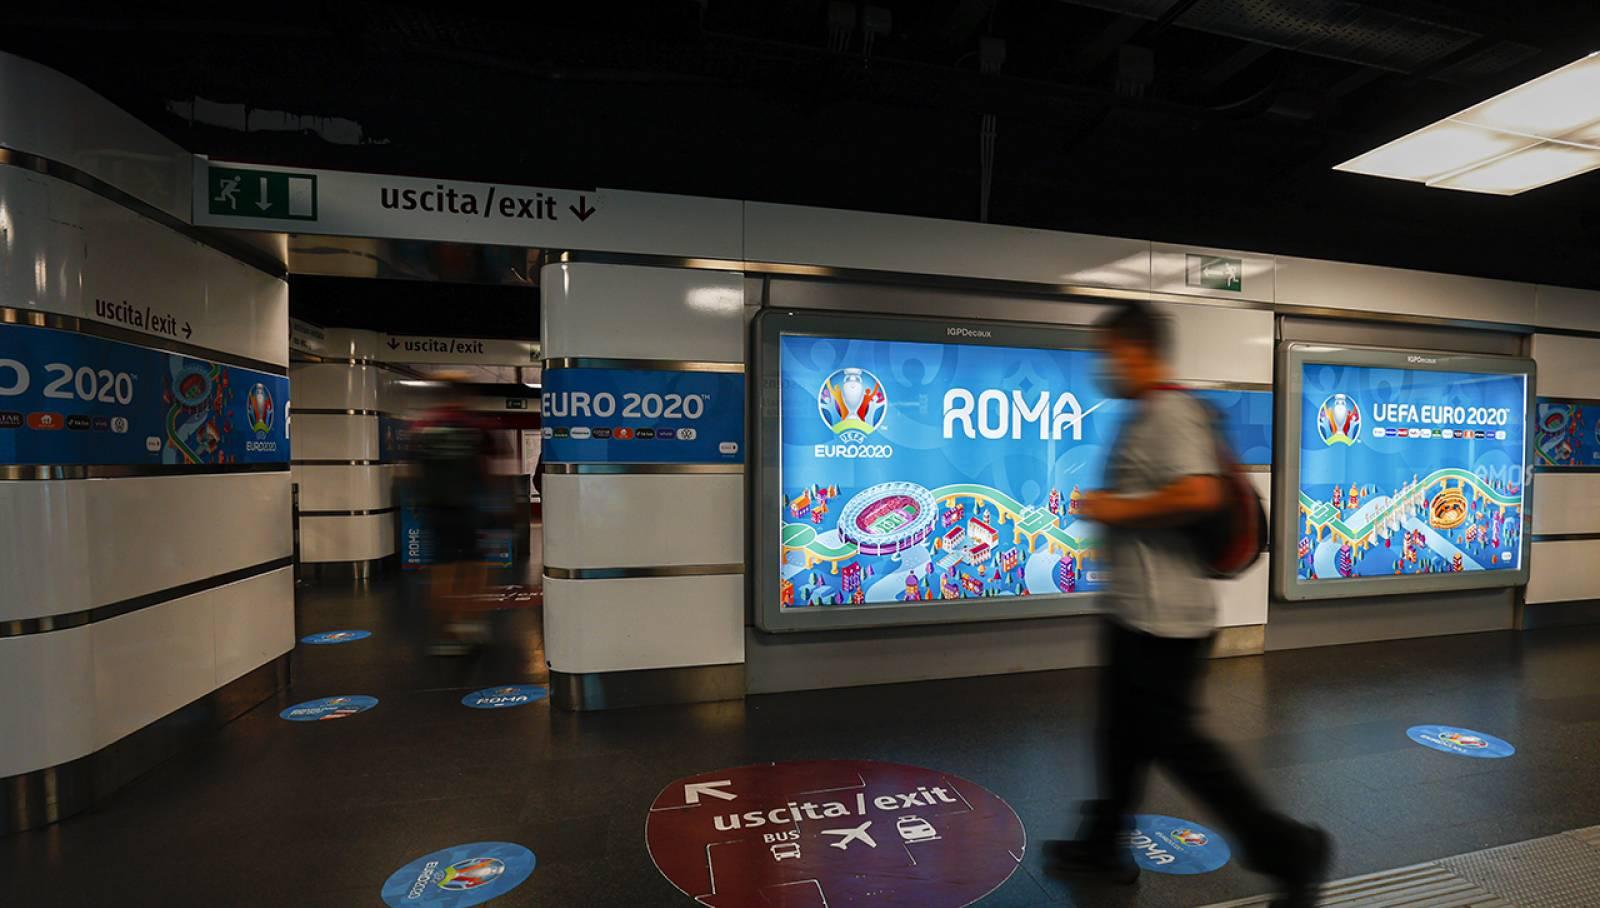 Pubblicità in metropolitana IGPDecaux Station Domination a Roma per UEFA 2020